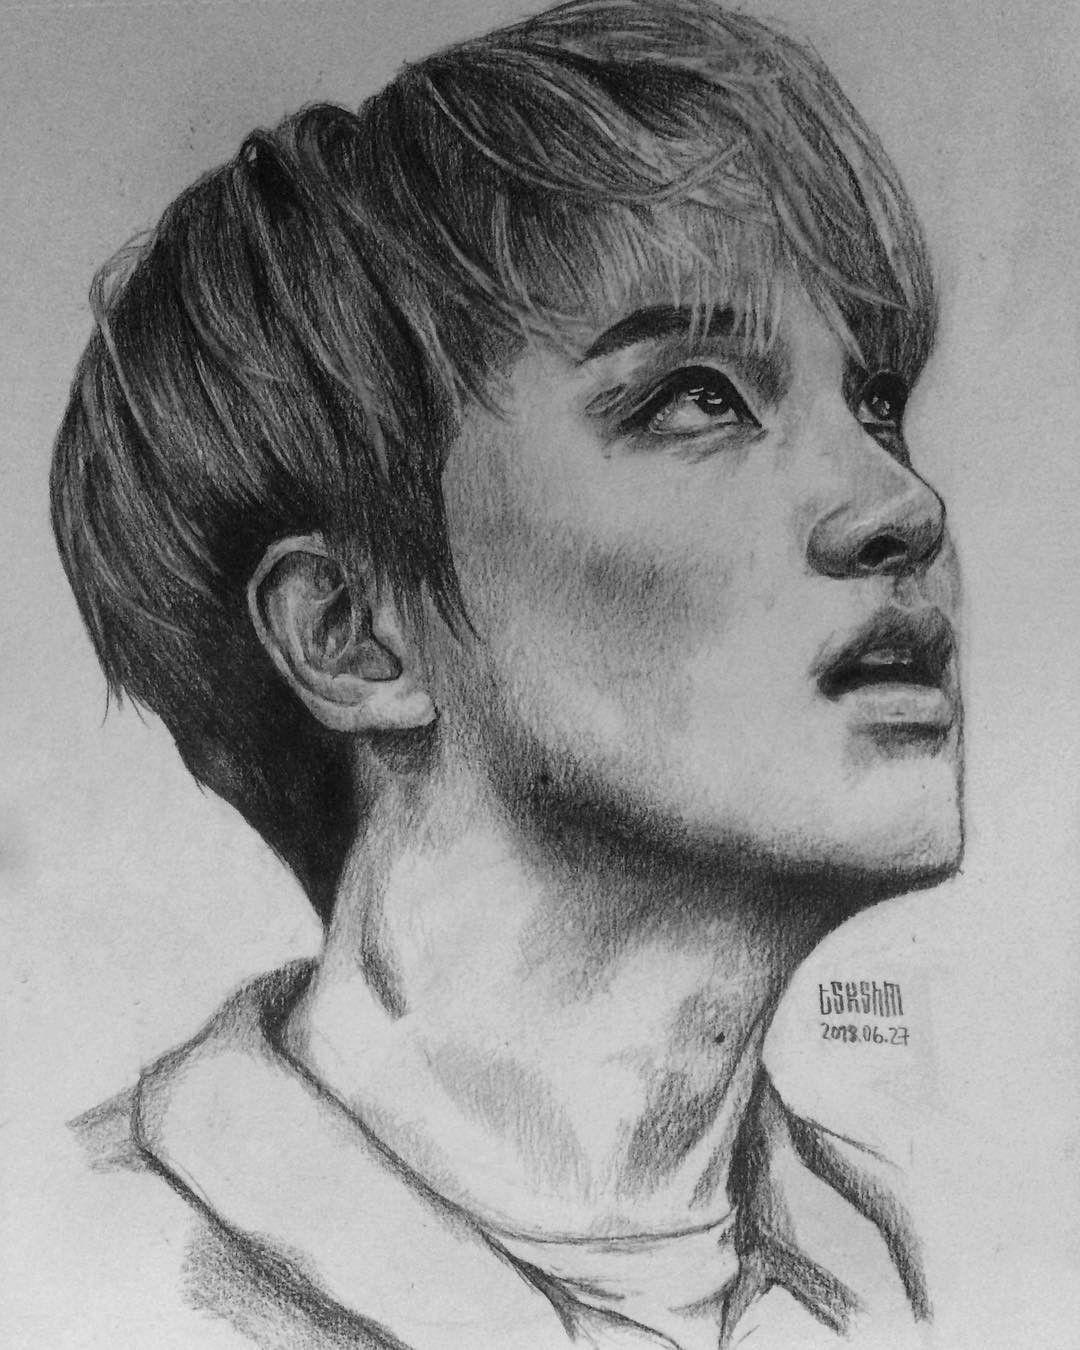 Nct S Haechan Fanart Nct Haechan Fanart Kpop Drawing Sketch Cara Menggambar Gambar Sketsa